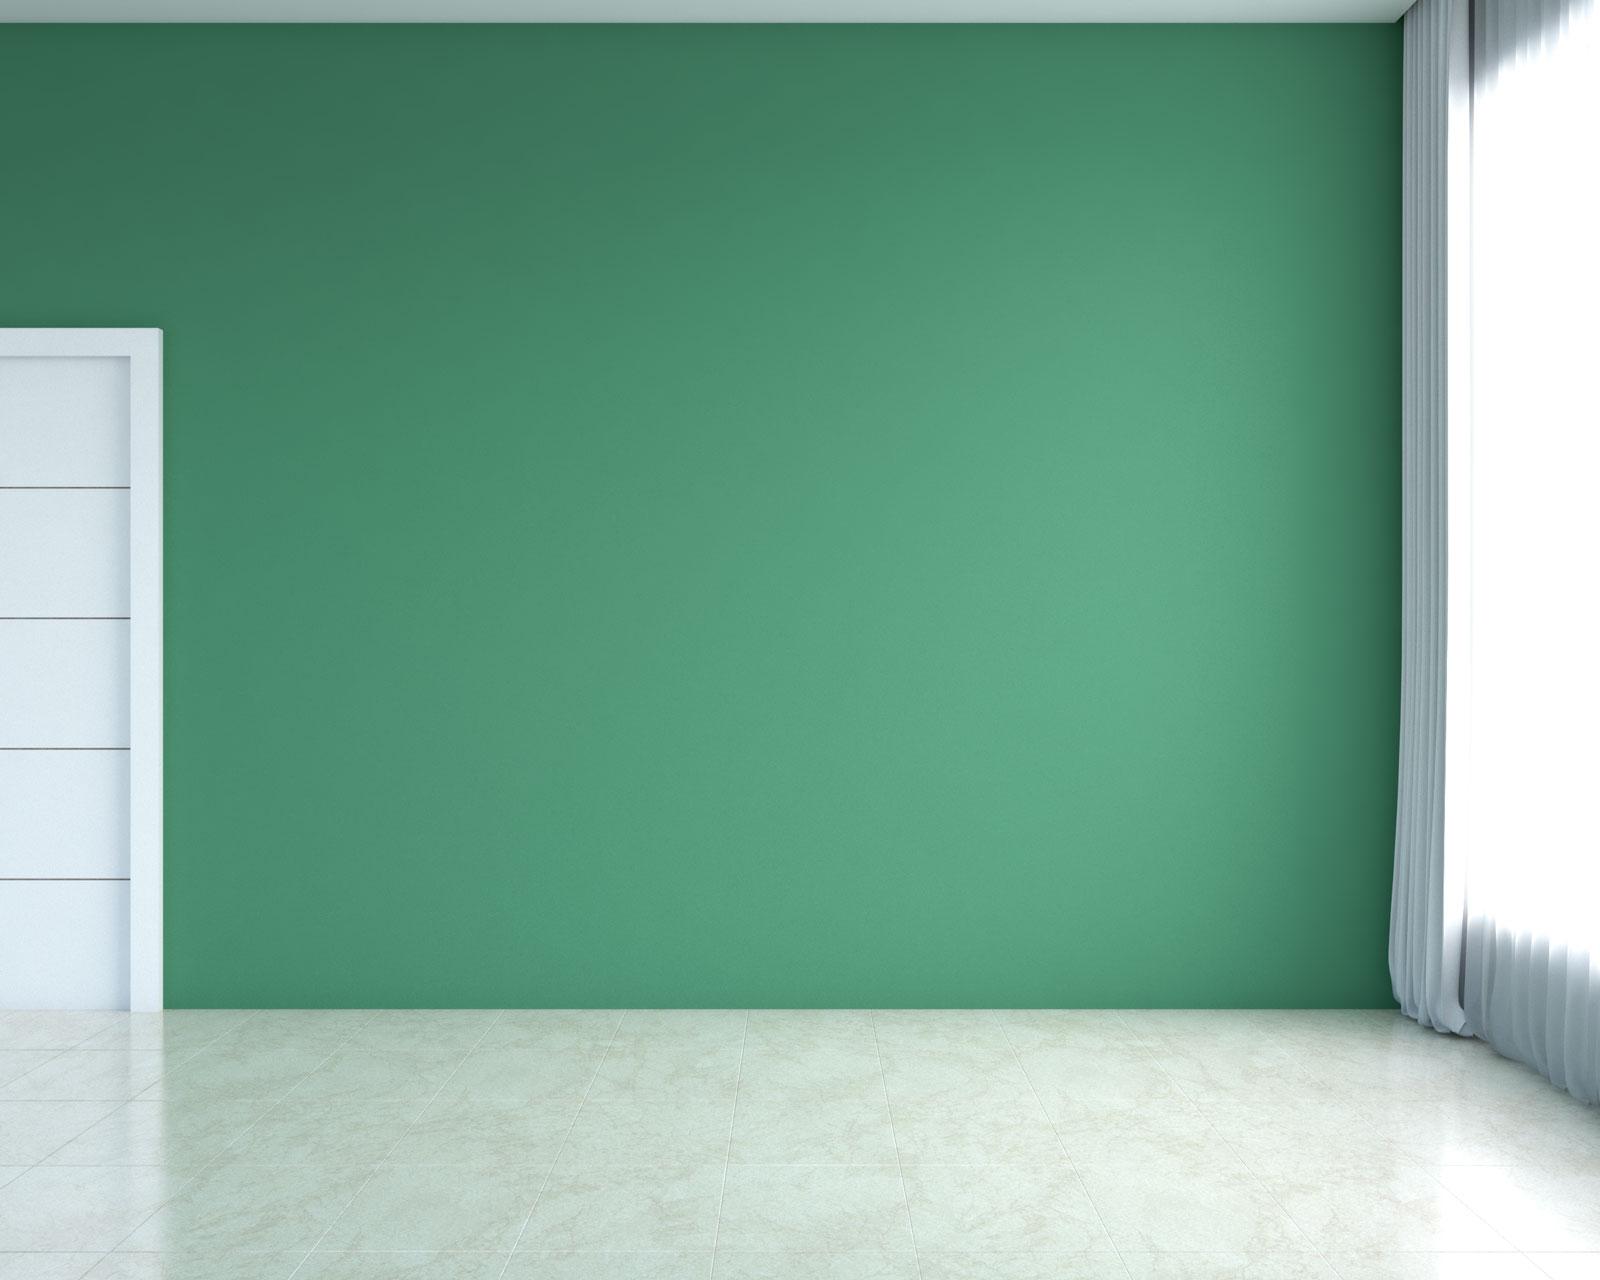 Cream tile flooring with green walls